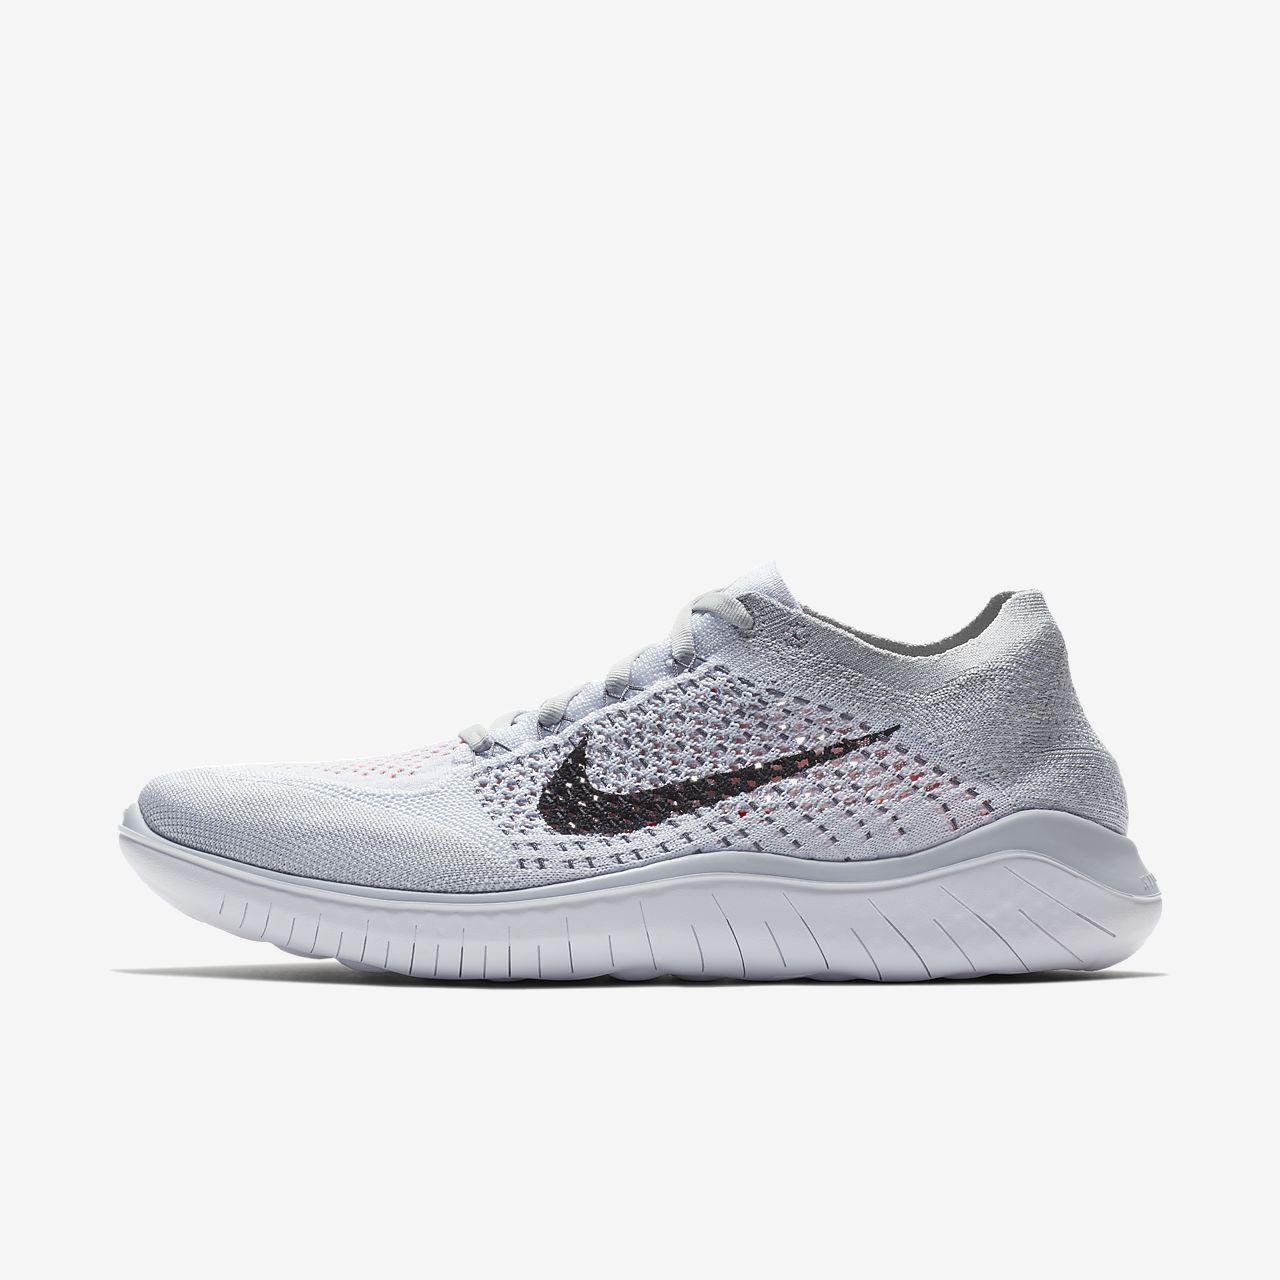 Free Rn Flyknit 2018 Men S Running Shoe Running Shoes For Men Black Running Shoes Nike Free